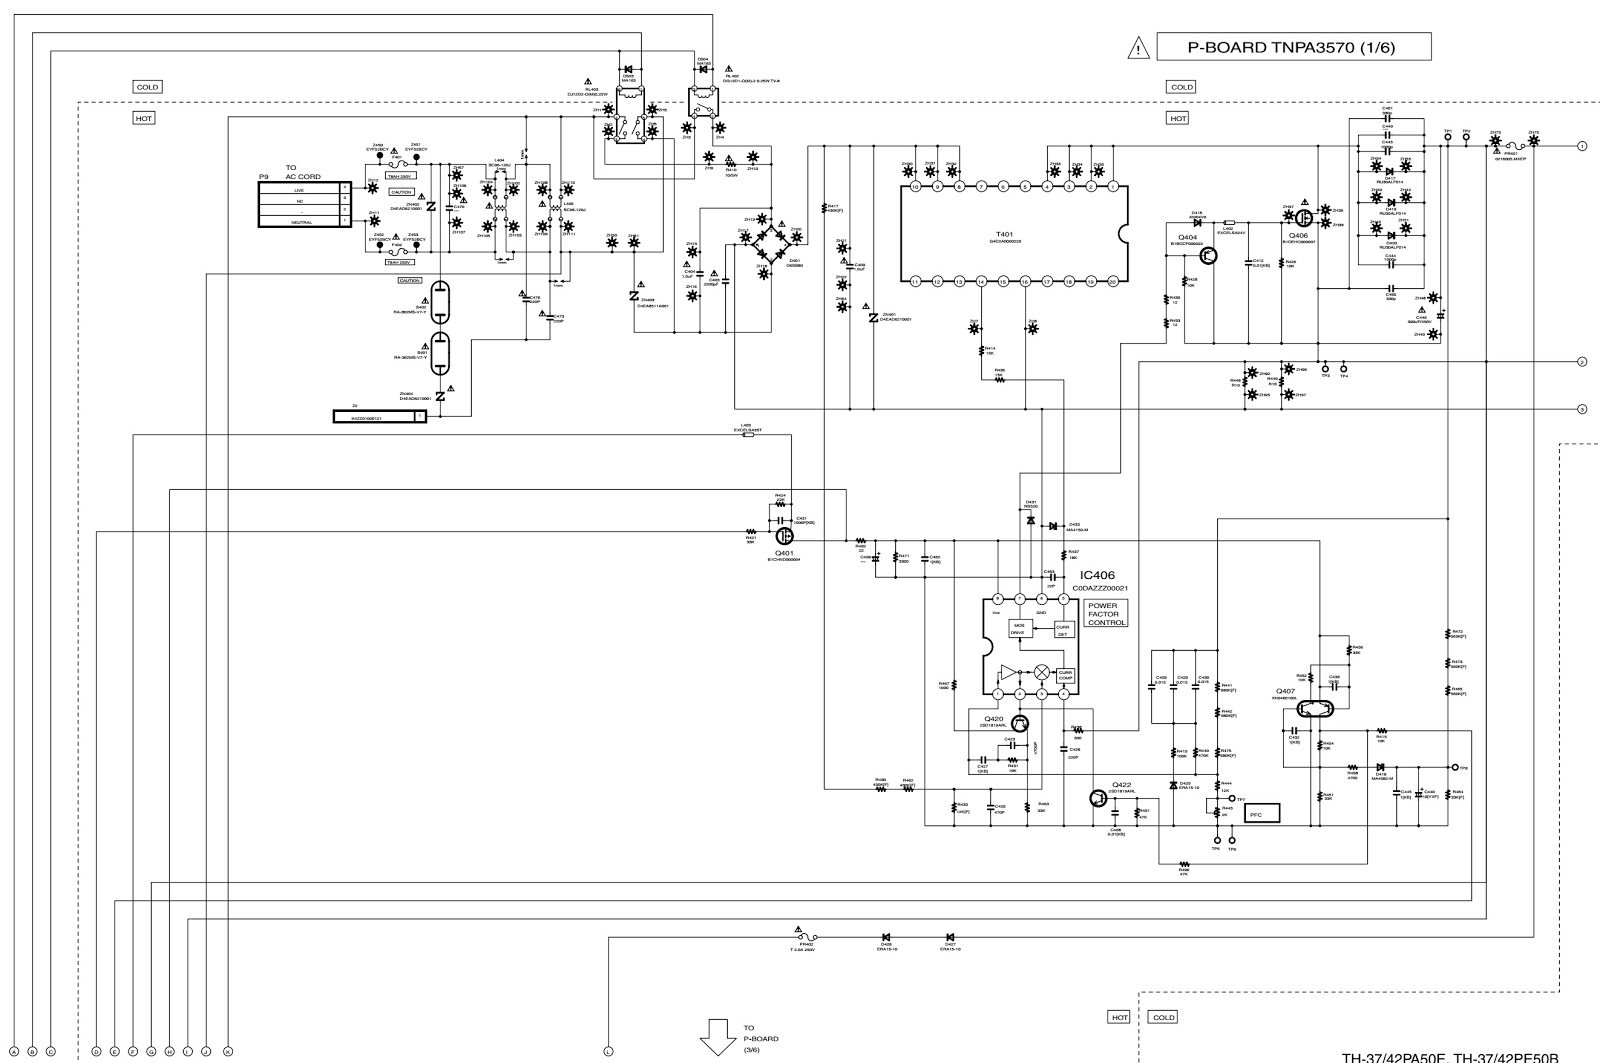 hight resolution of panasonic plasma tv th42 th37 power board schematic schematic panasonic plasma tv circuit diagram panasonic plasma tv diagram